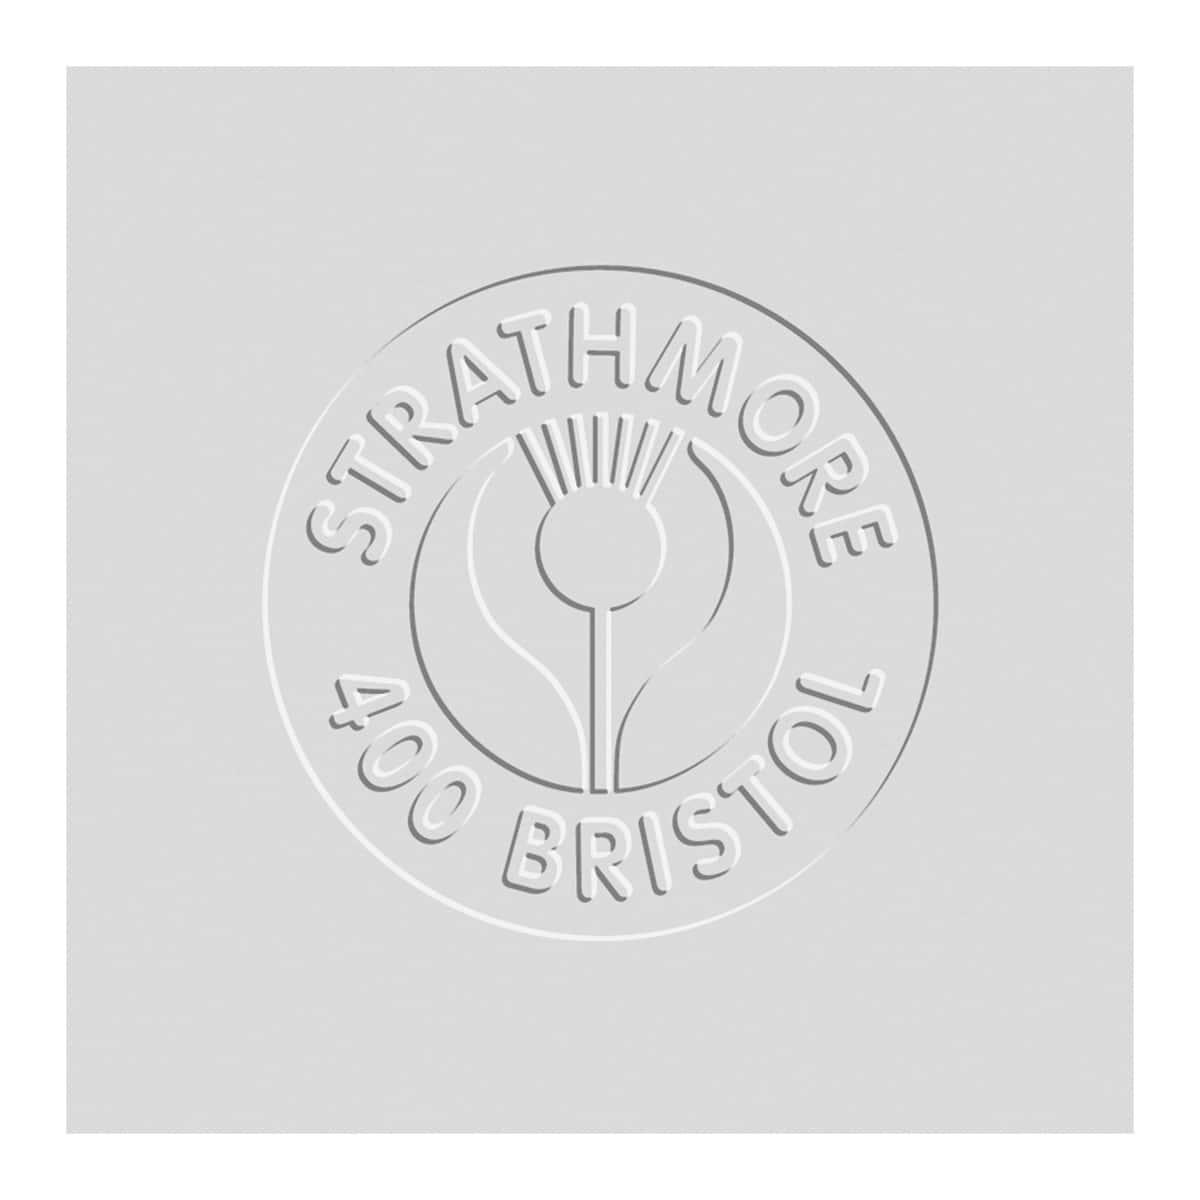 Strathmore® 400 Series 4-Ply Bristol Sheet, Vellum